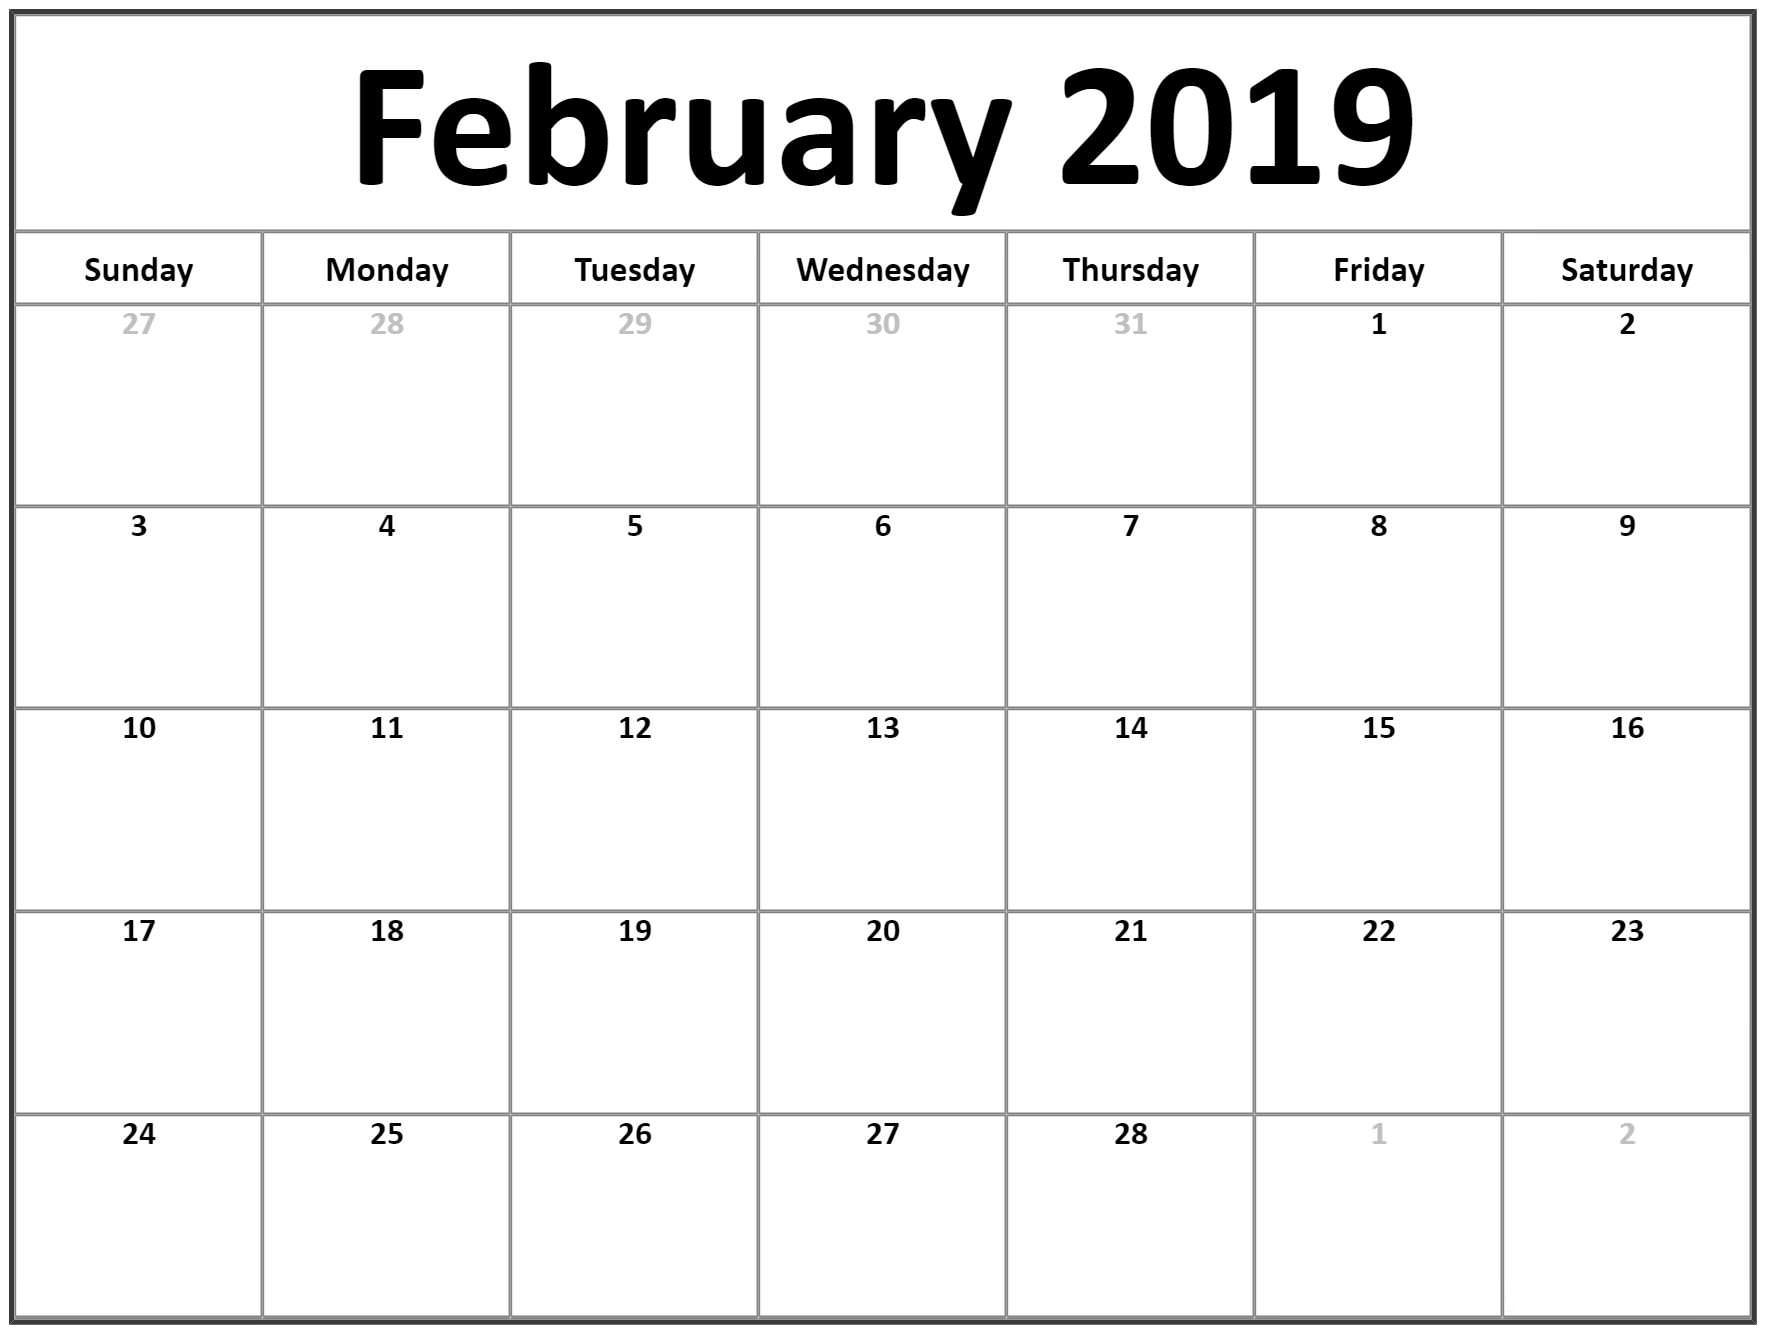 february 2019 landscape portrait calendar template blank::Blank February 2019 Calendar